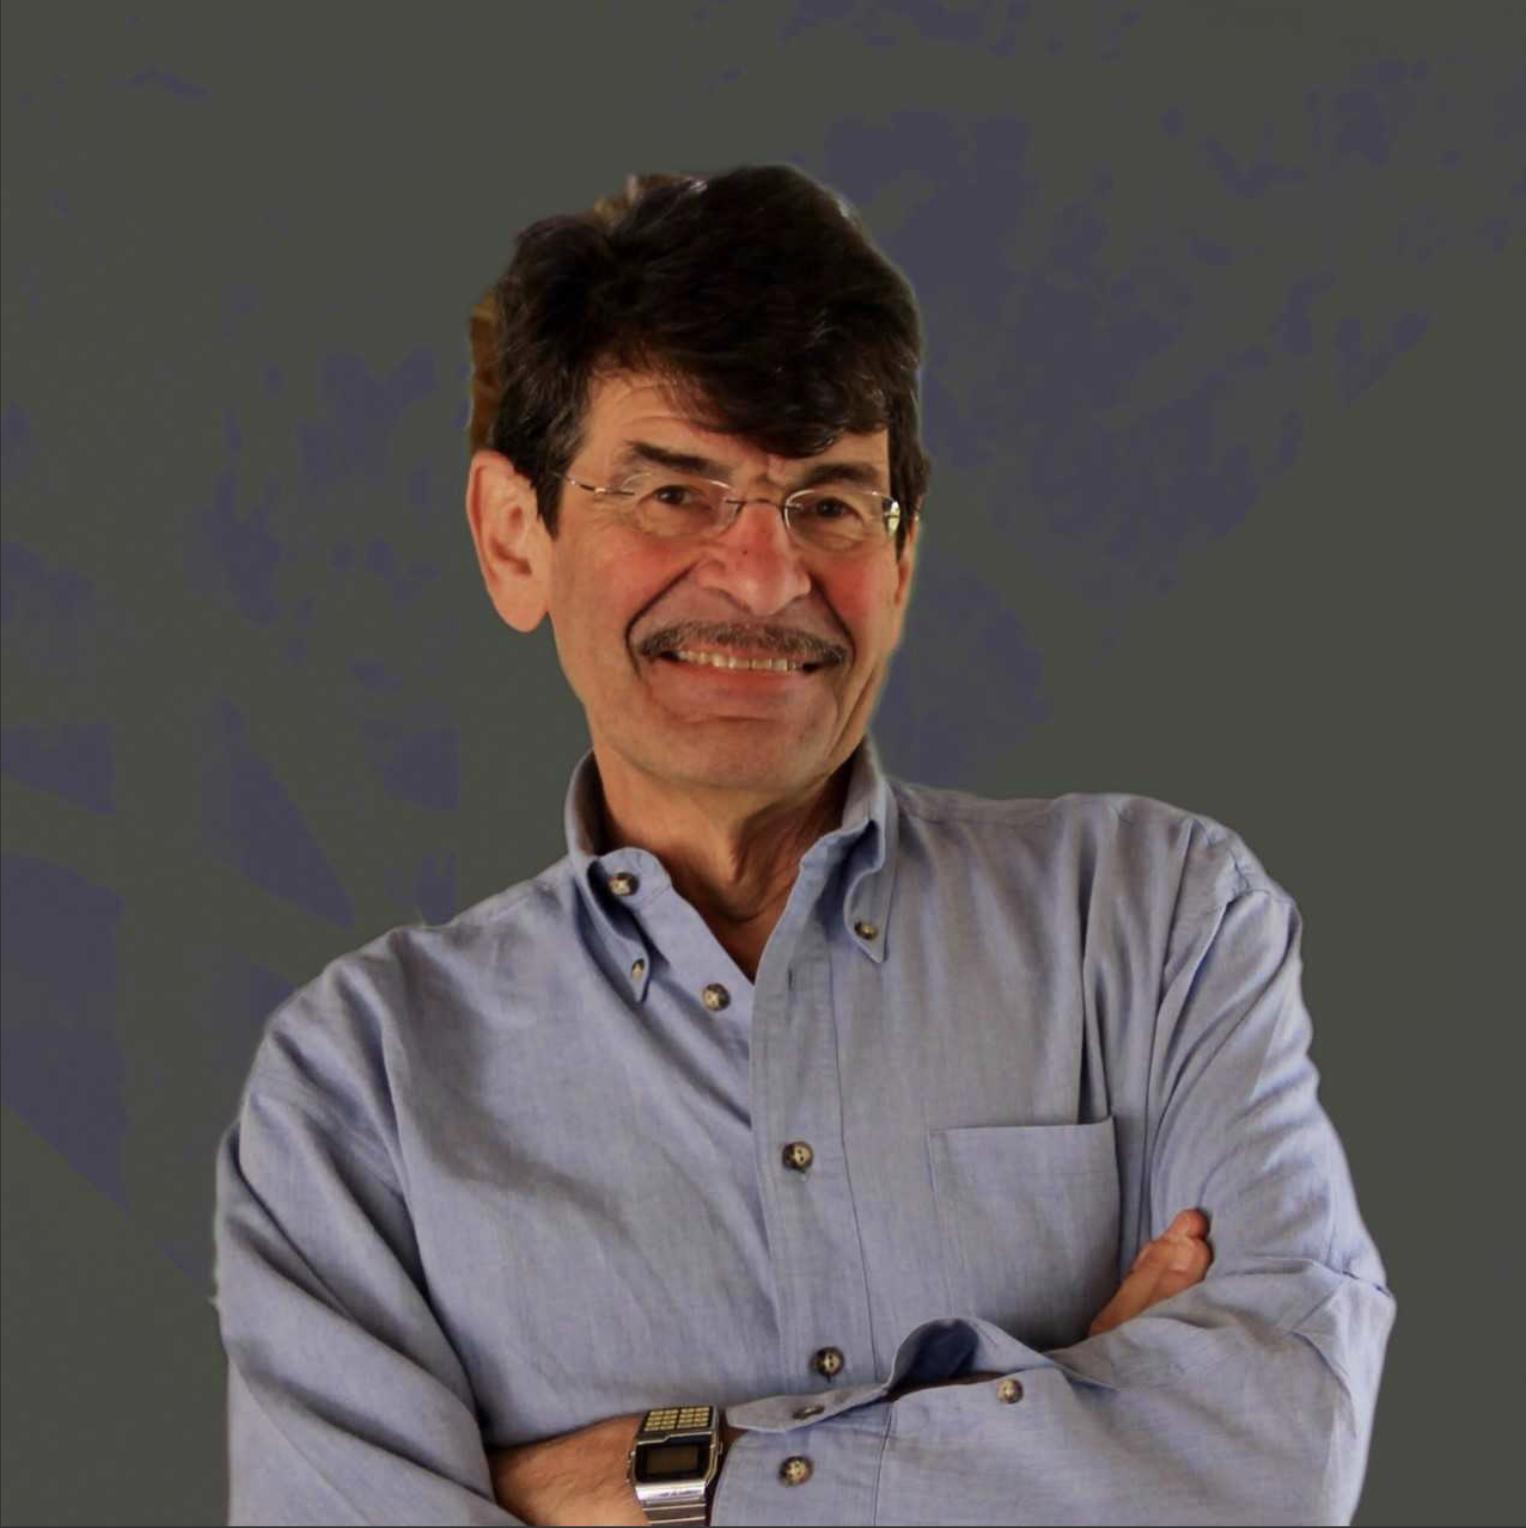 Henry Tenenbaum, former KRON investigative reporter